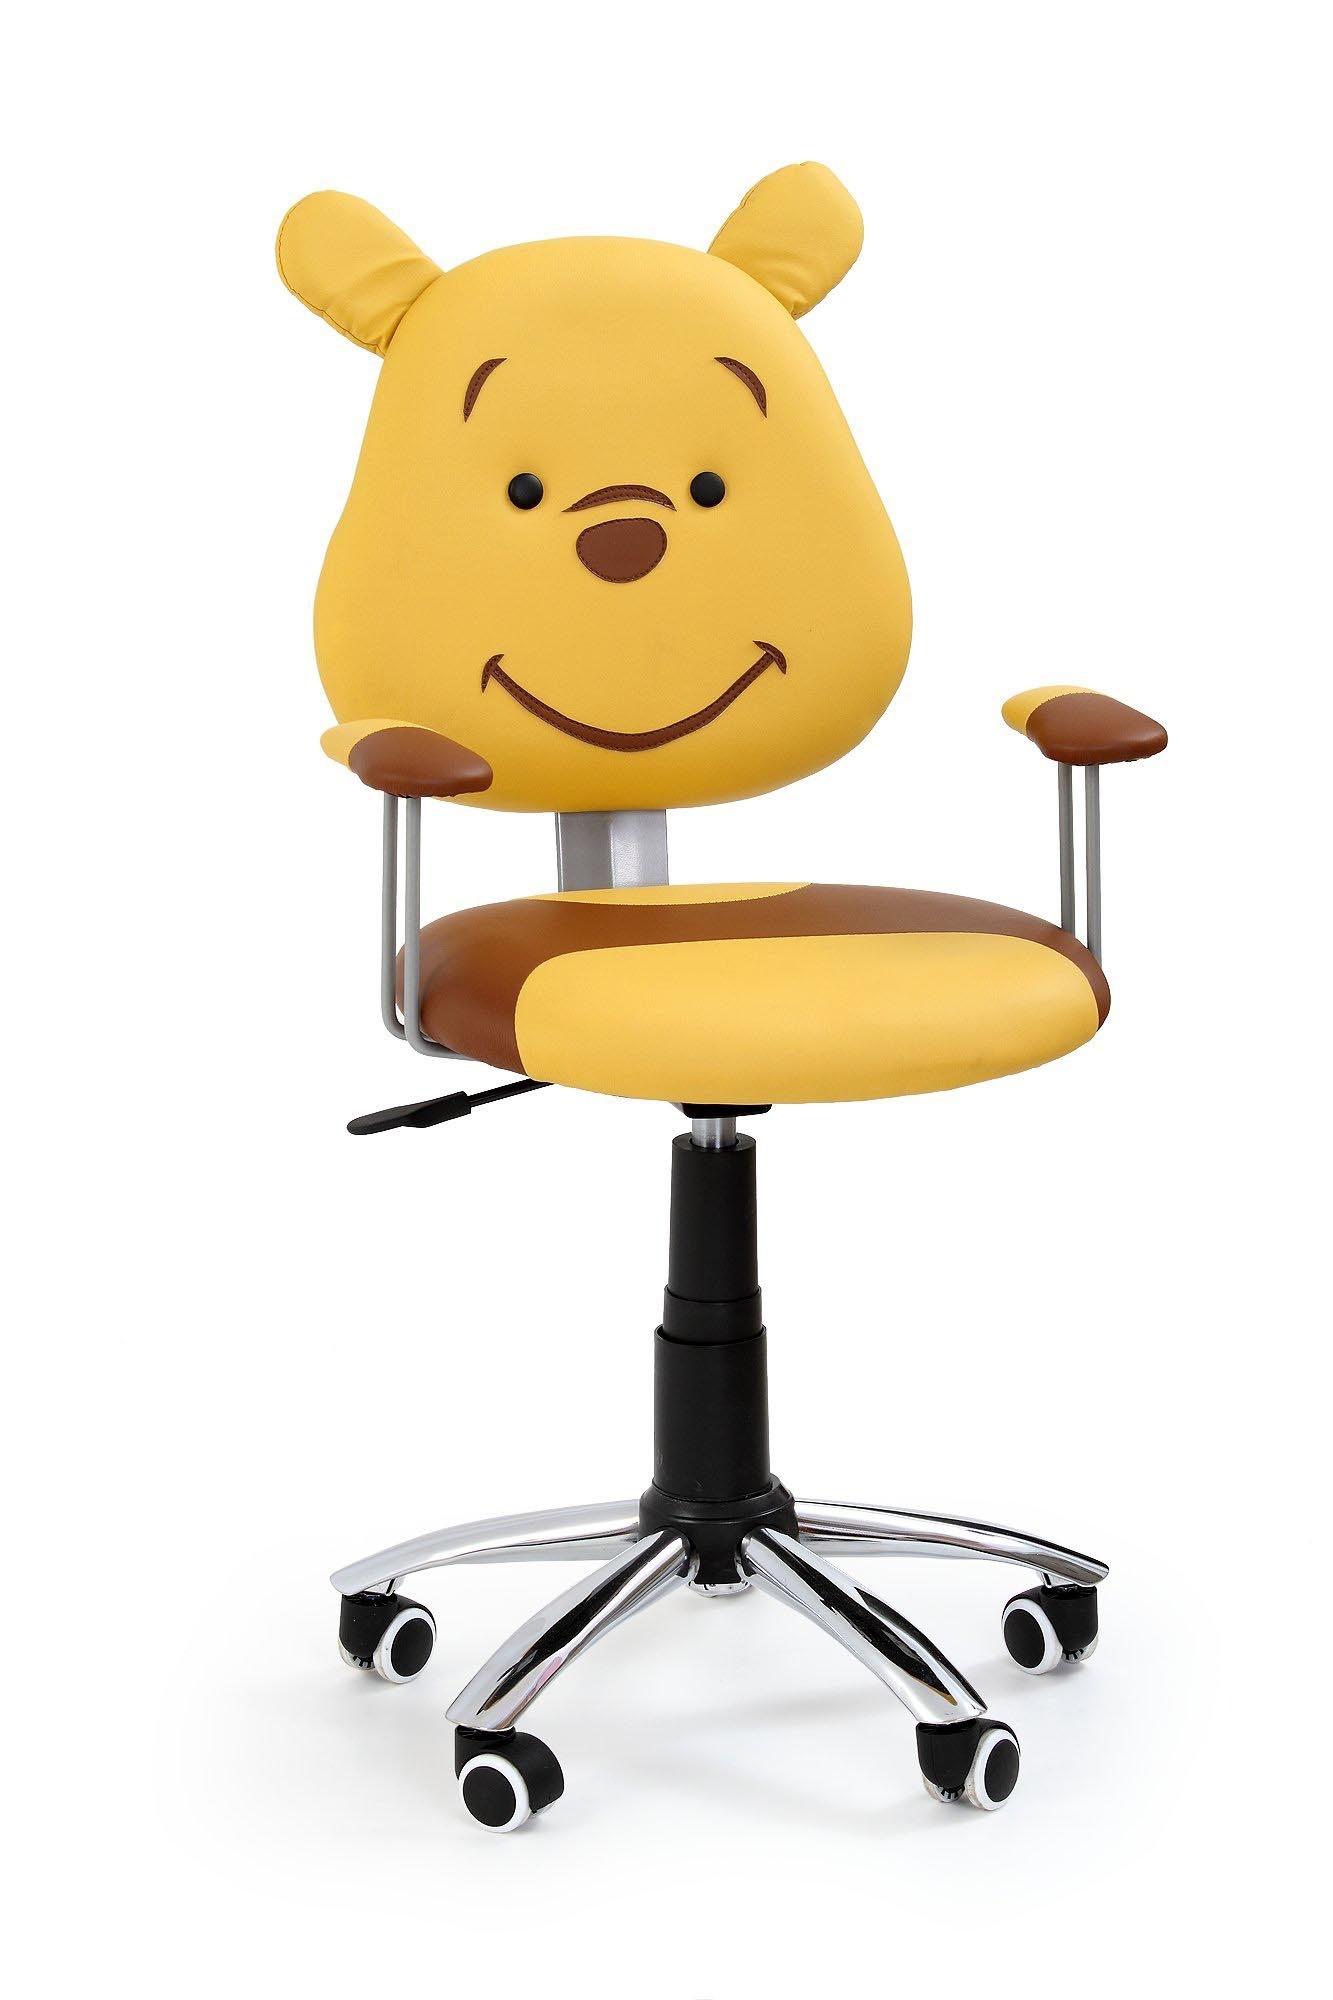 Scaun de birou pentru copii, tapitat cu piele ecologica Kubus Maro / Galben, l44xA50xH82-92 cm imagine